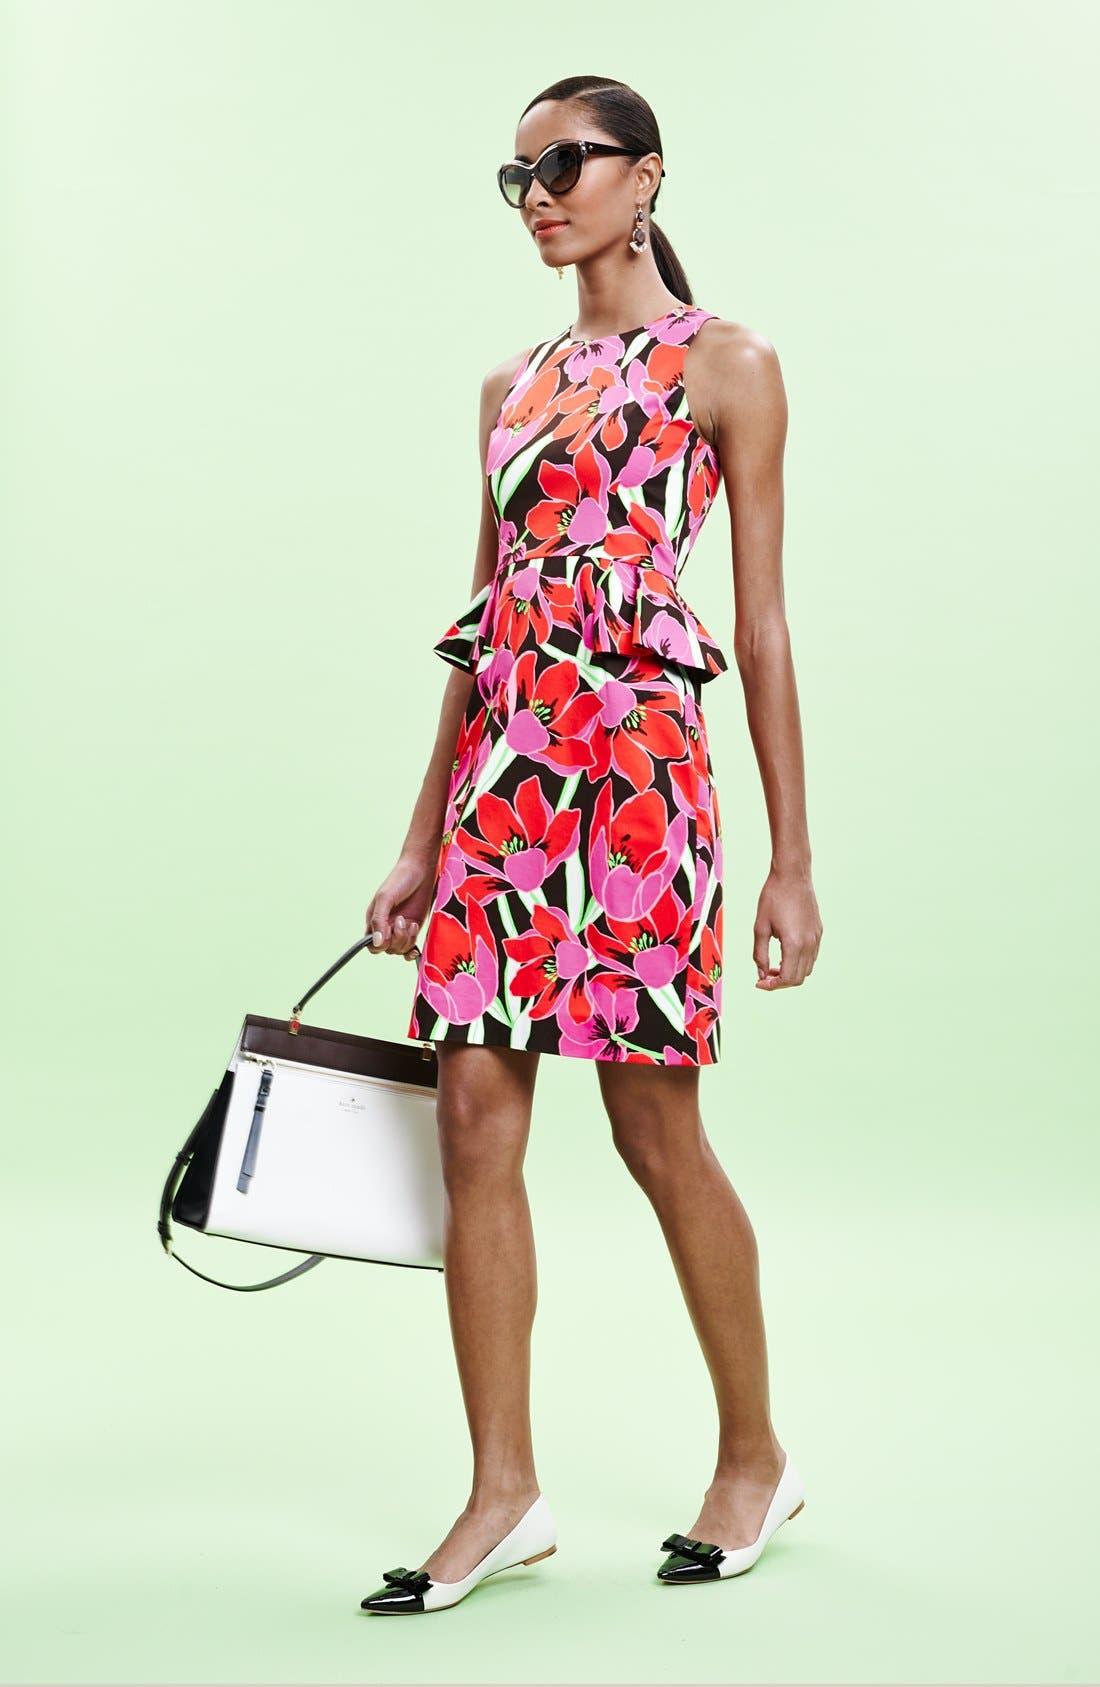 KATE SPADE NEW YORK,                             tropical print peplum sheath dress,                             Alternate thumbnail 4, color,                             650